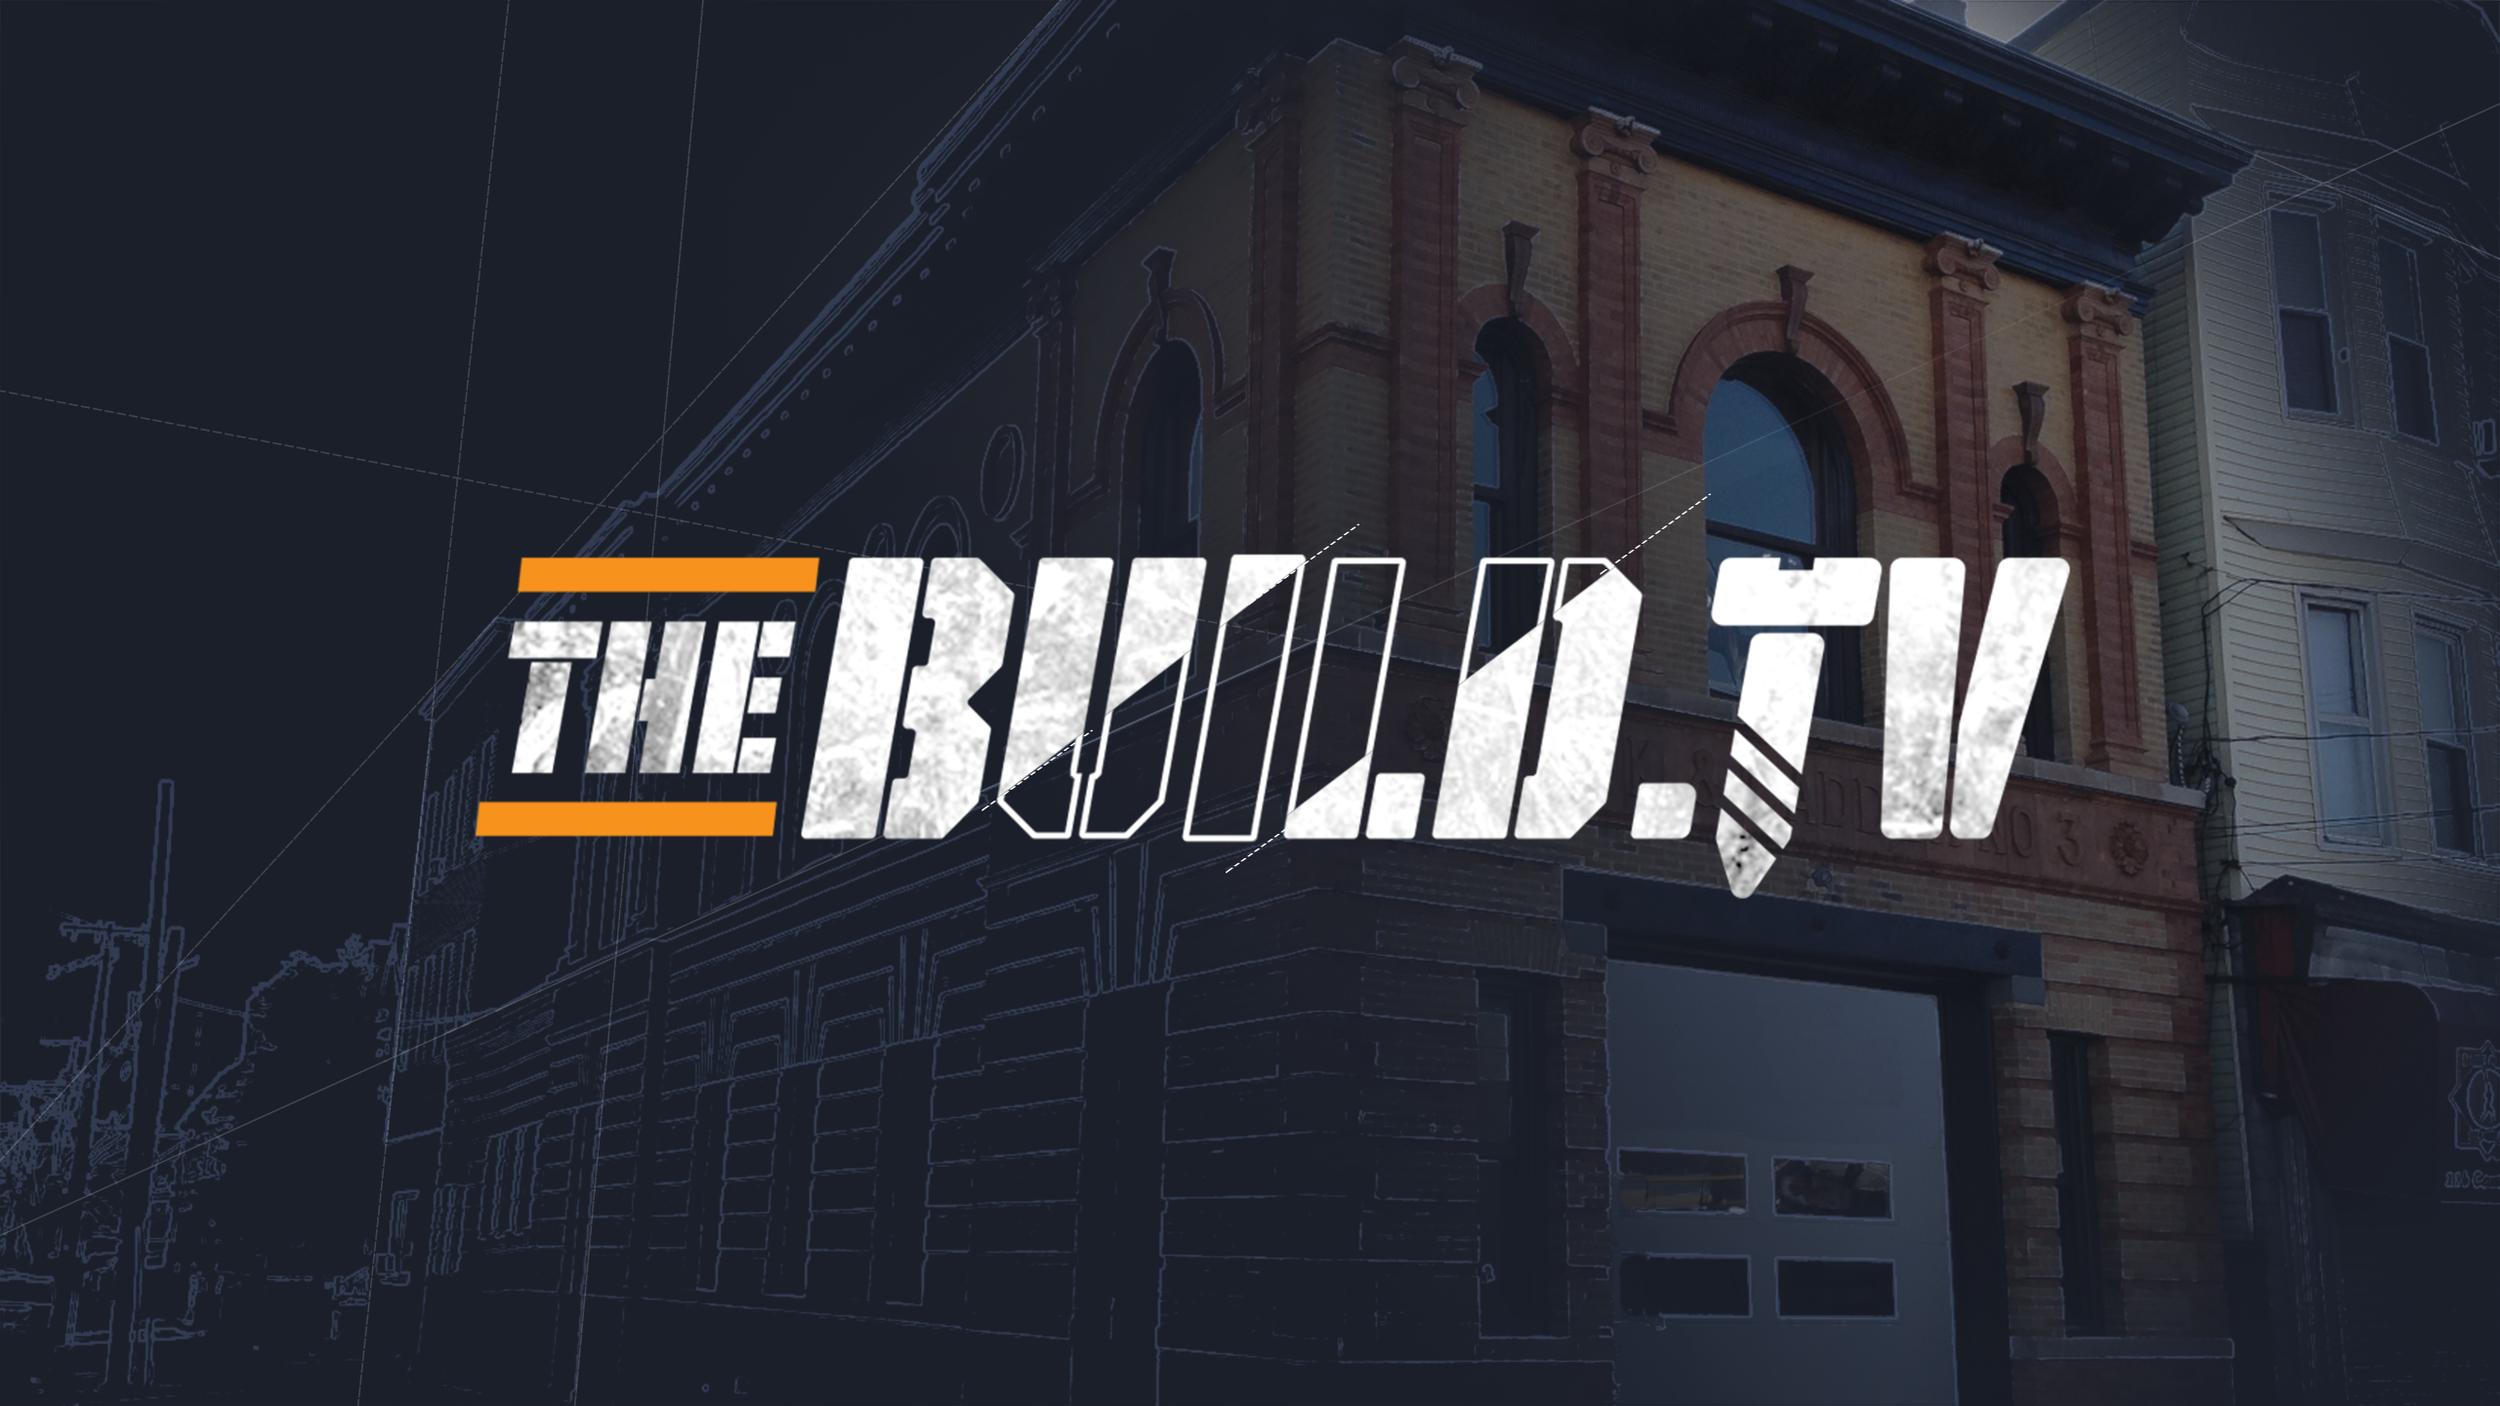 theBuildTv_Logo-youtube.png